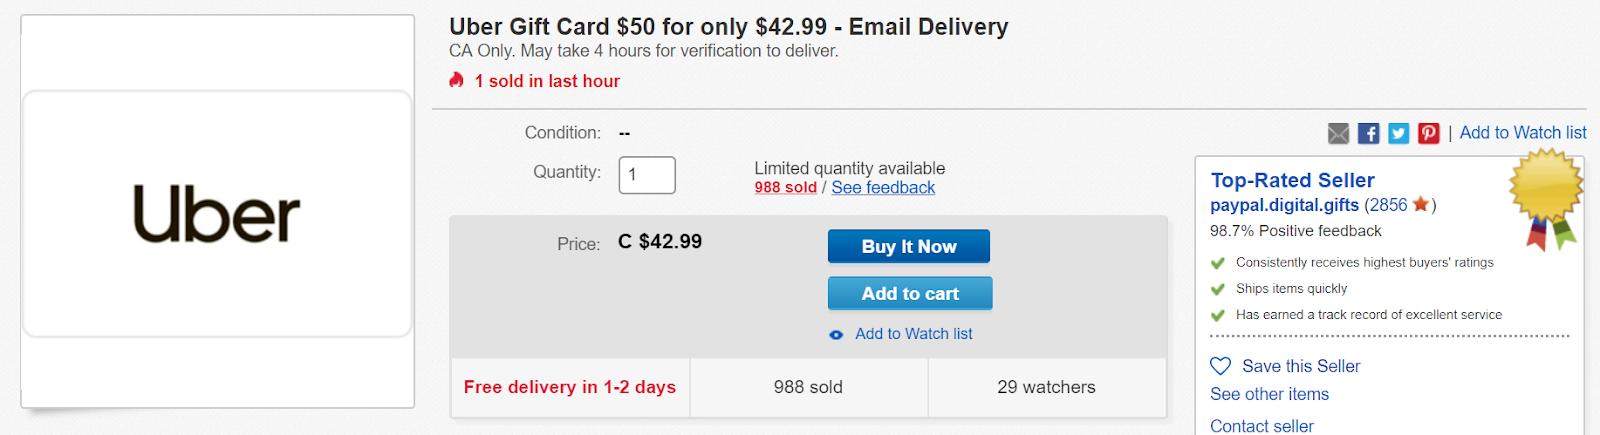 Canadian Rewards Ebay 50 Uber Gift Card For Only 42 99